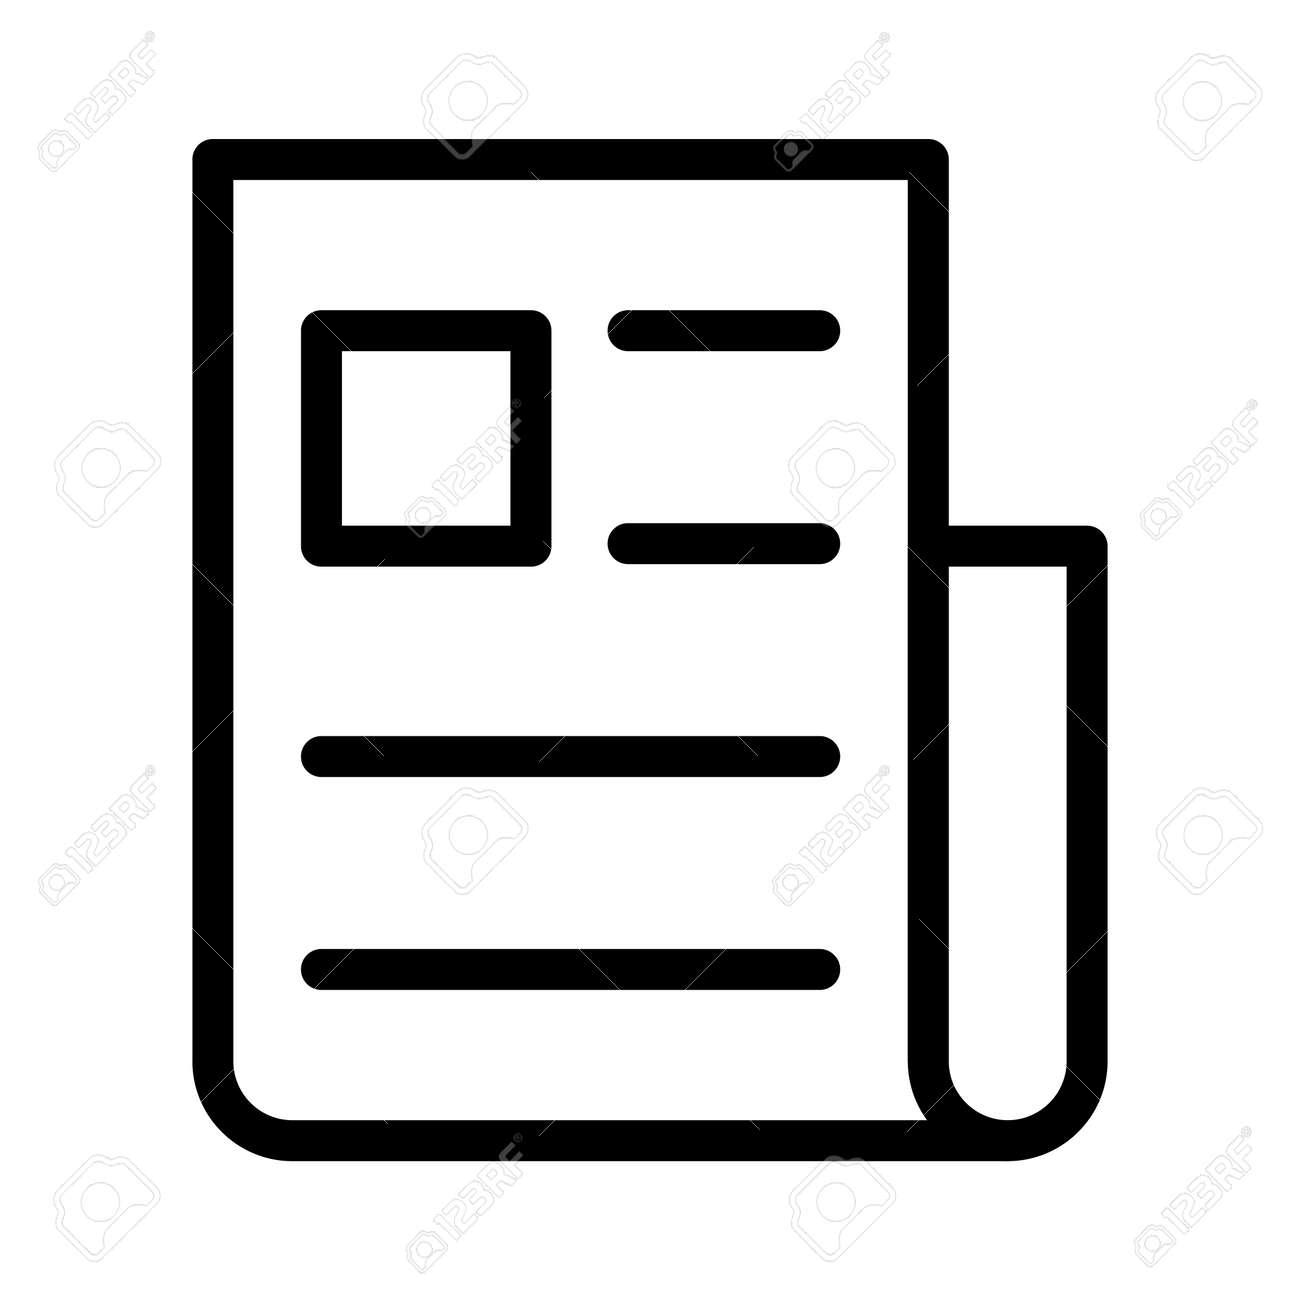 paper - 127895614